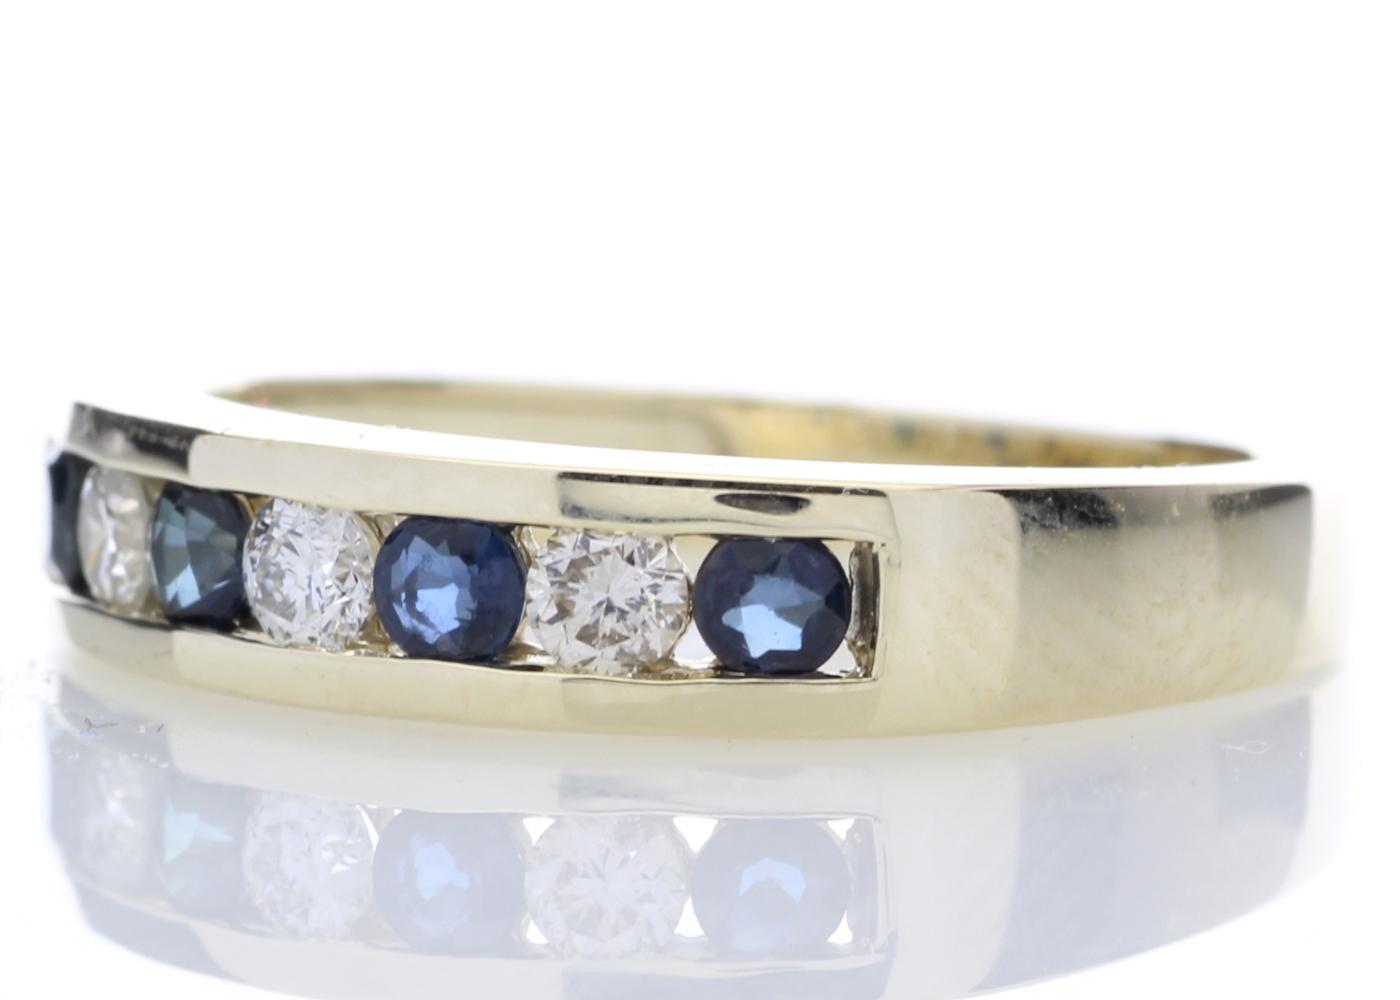 9ct Yellow Gold Channel Set Semi Eternity Diamond Ring 0.25 Carats - Image 2 of 5